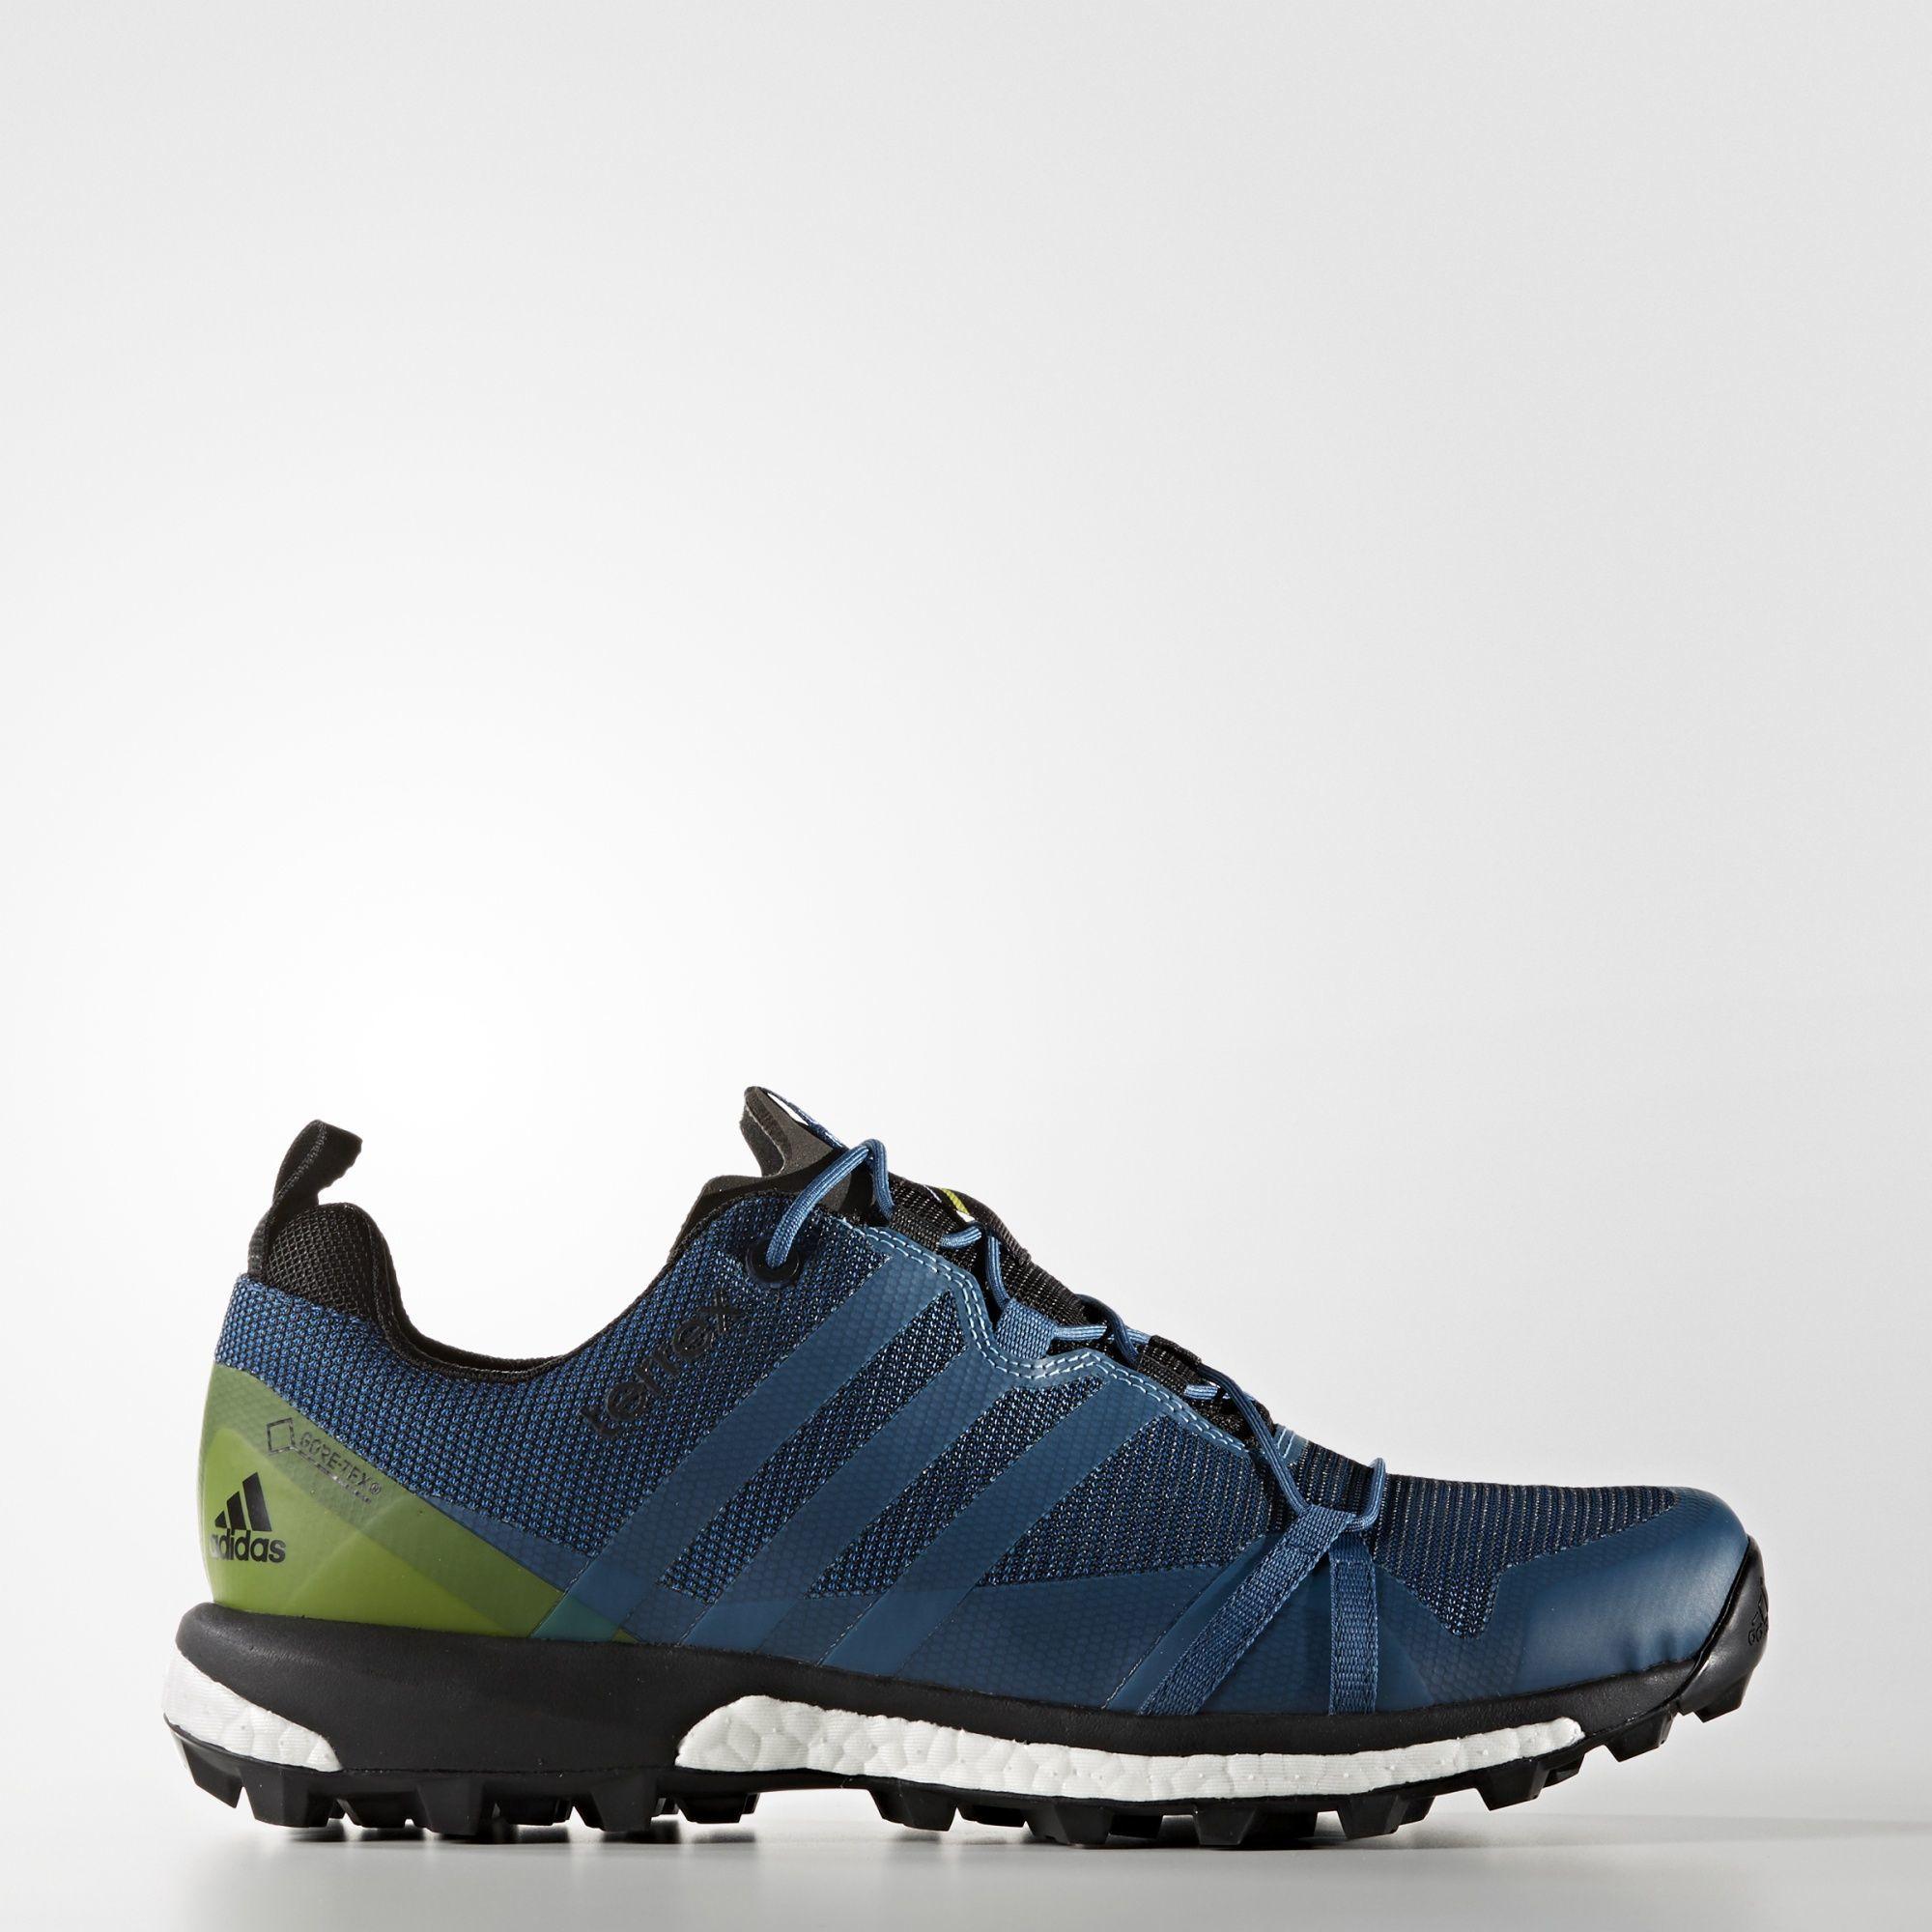 adidas Terrex Agravic GTX in Darkblue